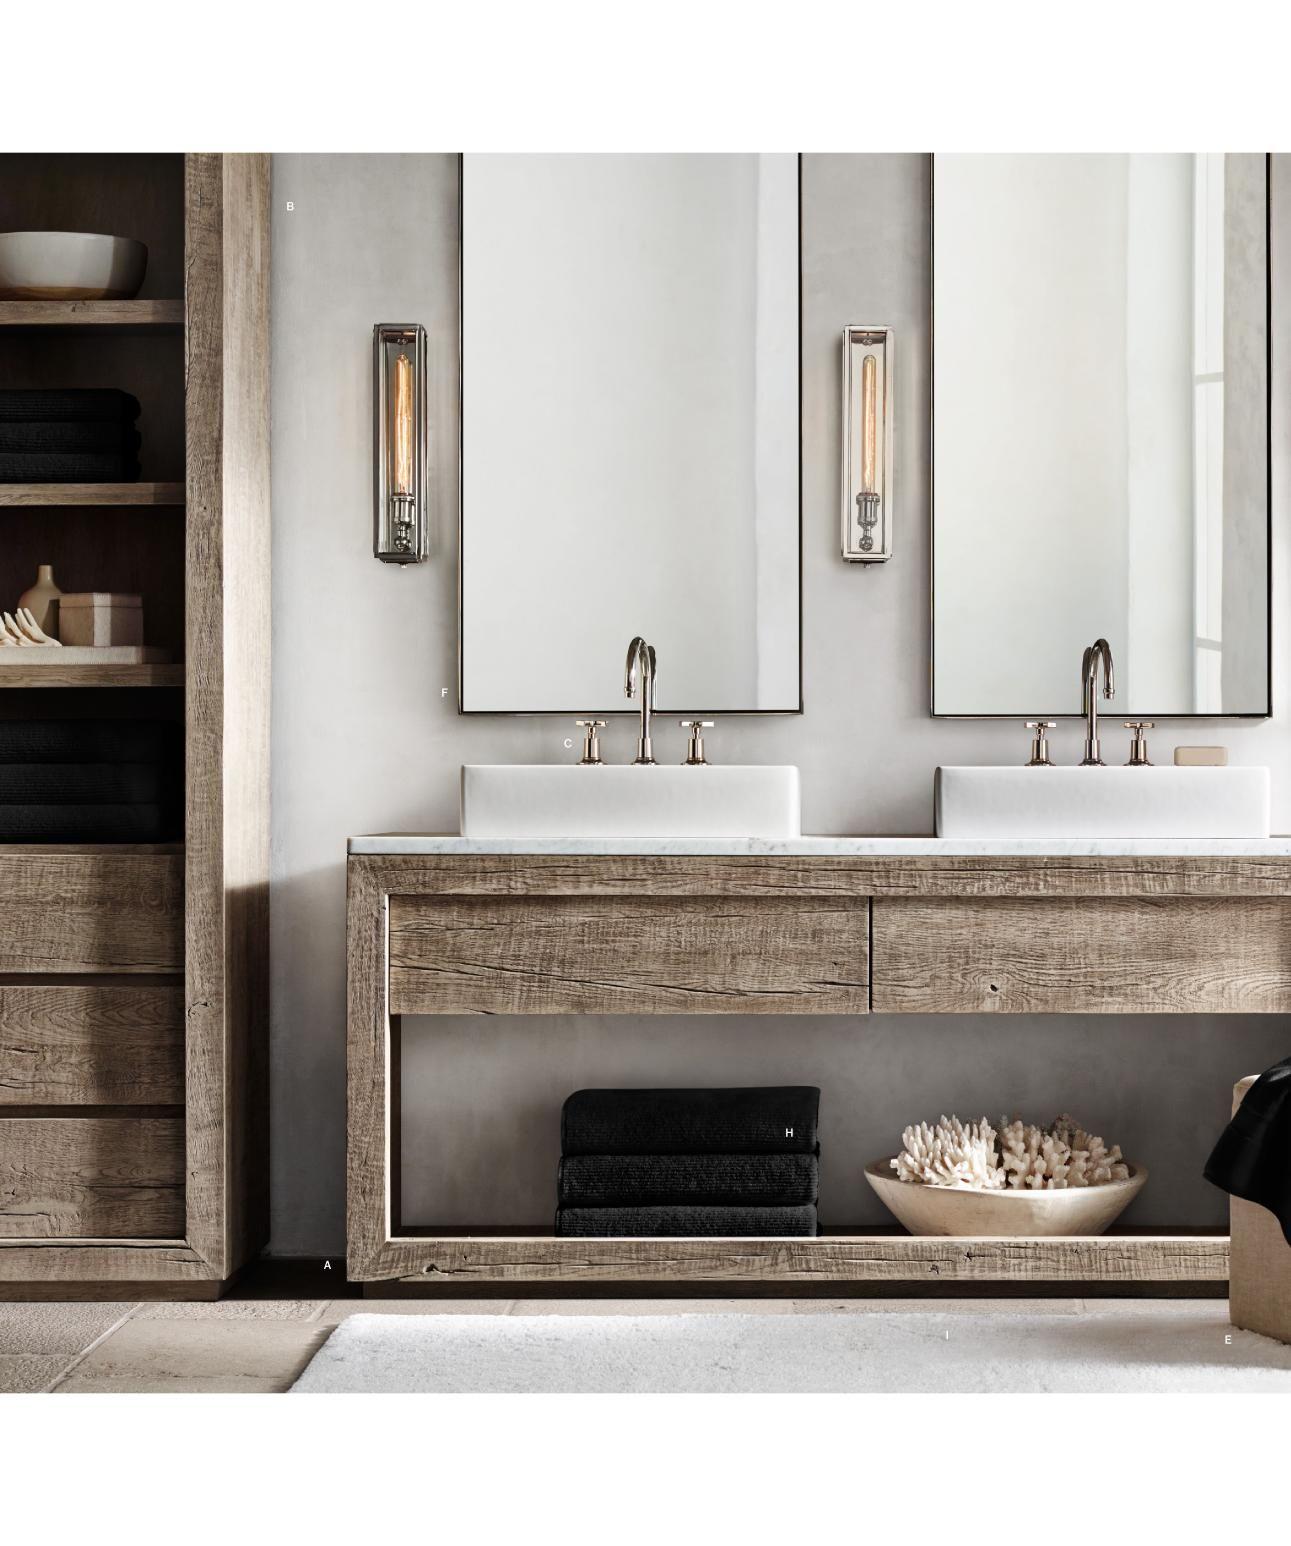 Rh Source Books Restoration Hardware Bathroom Bathroom Interior Bathroom Inspiration